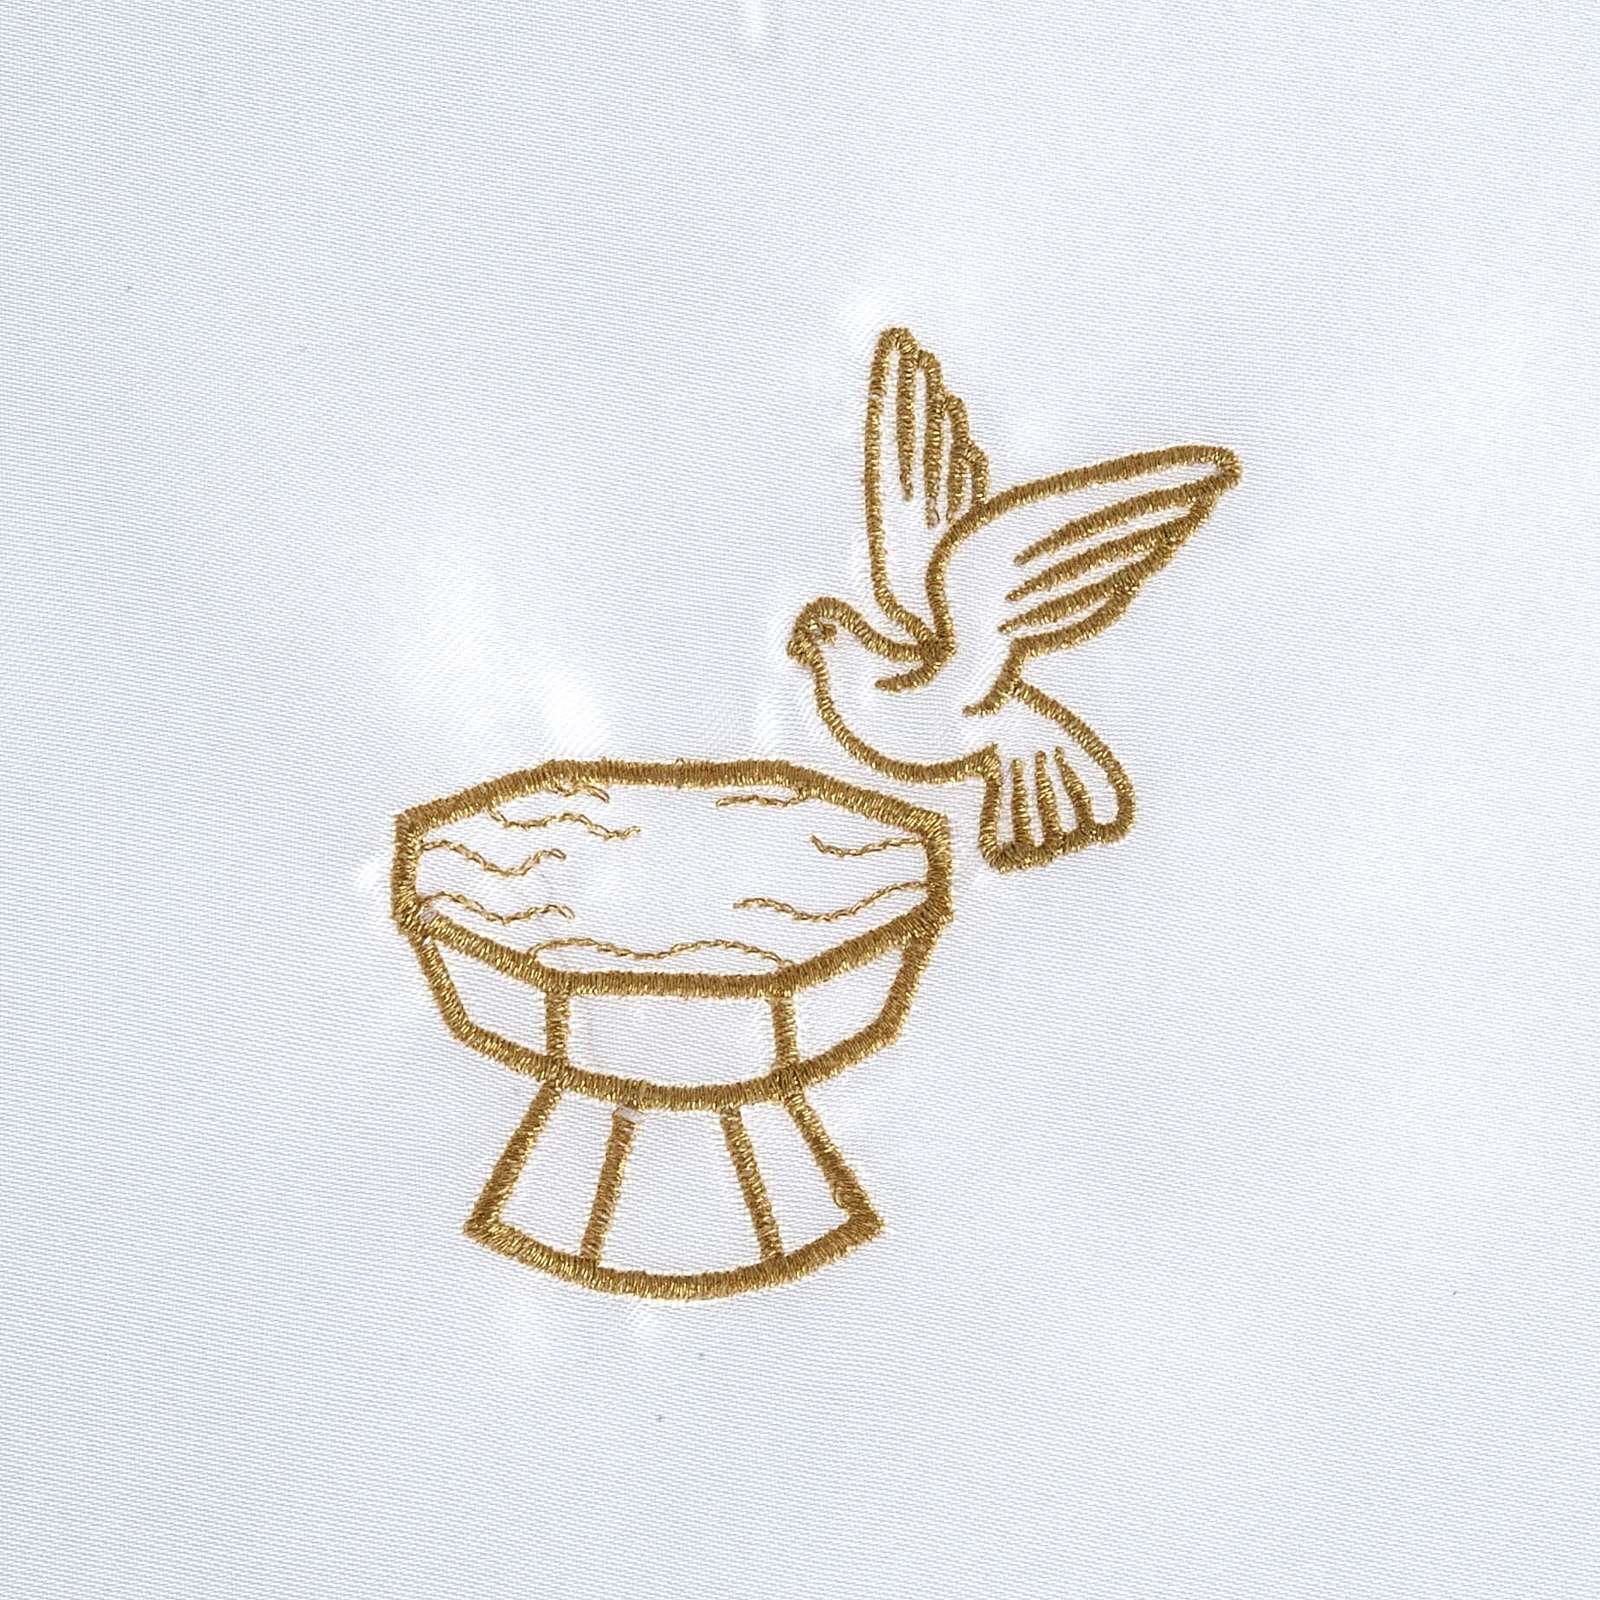 Vestina battesimo raso colomba fonte battesimale 4